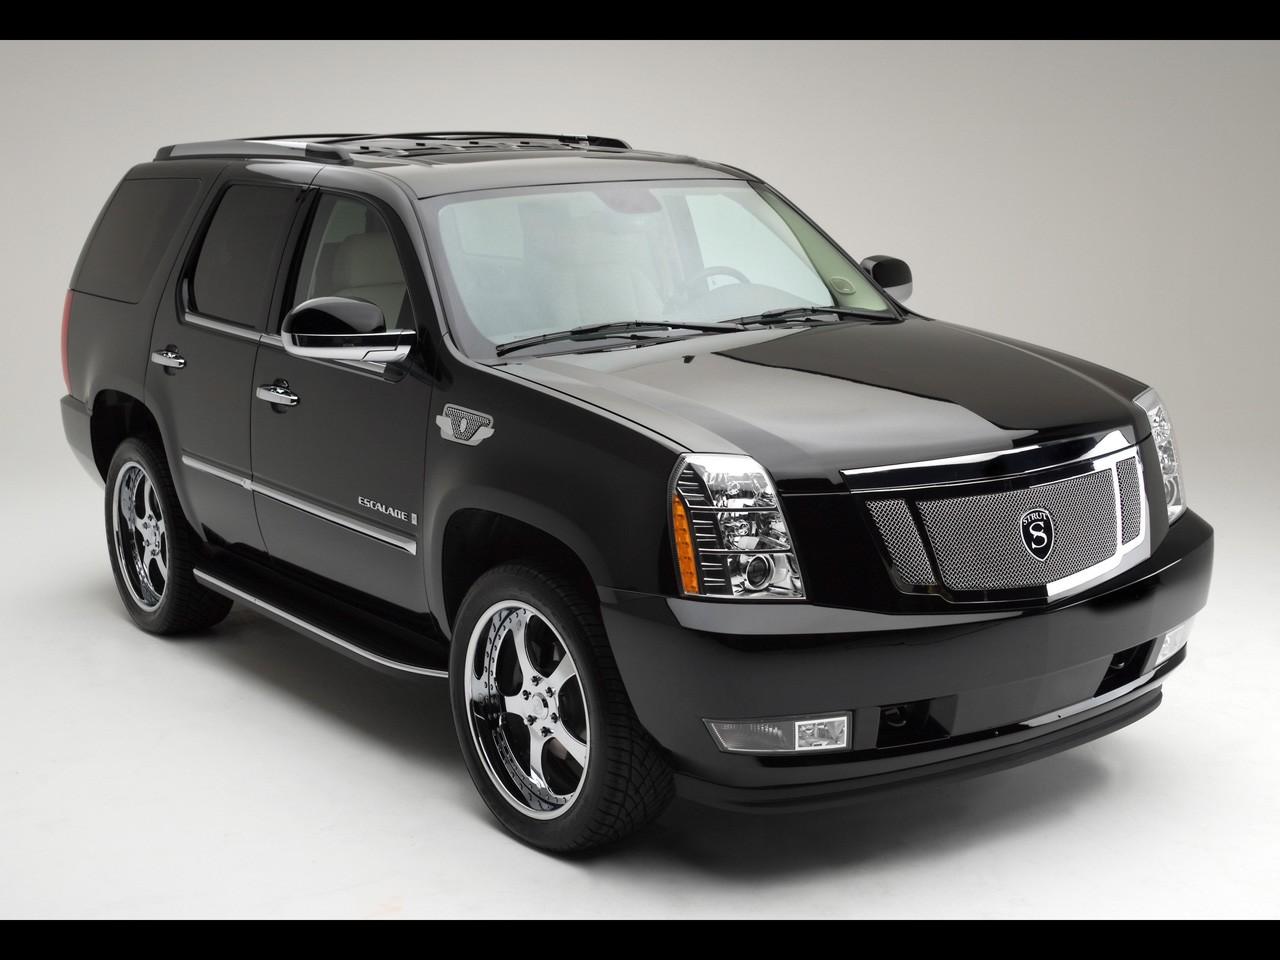 http://4.bp.blogspot.com/-illL4STDCyM/TaCTxzOy9uI/AAAAAAAAApM/R1VaOgXwc_8/s1600/Cadillac_Escalade_black.jpg